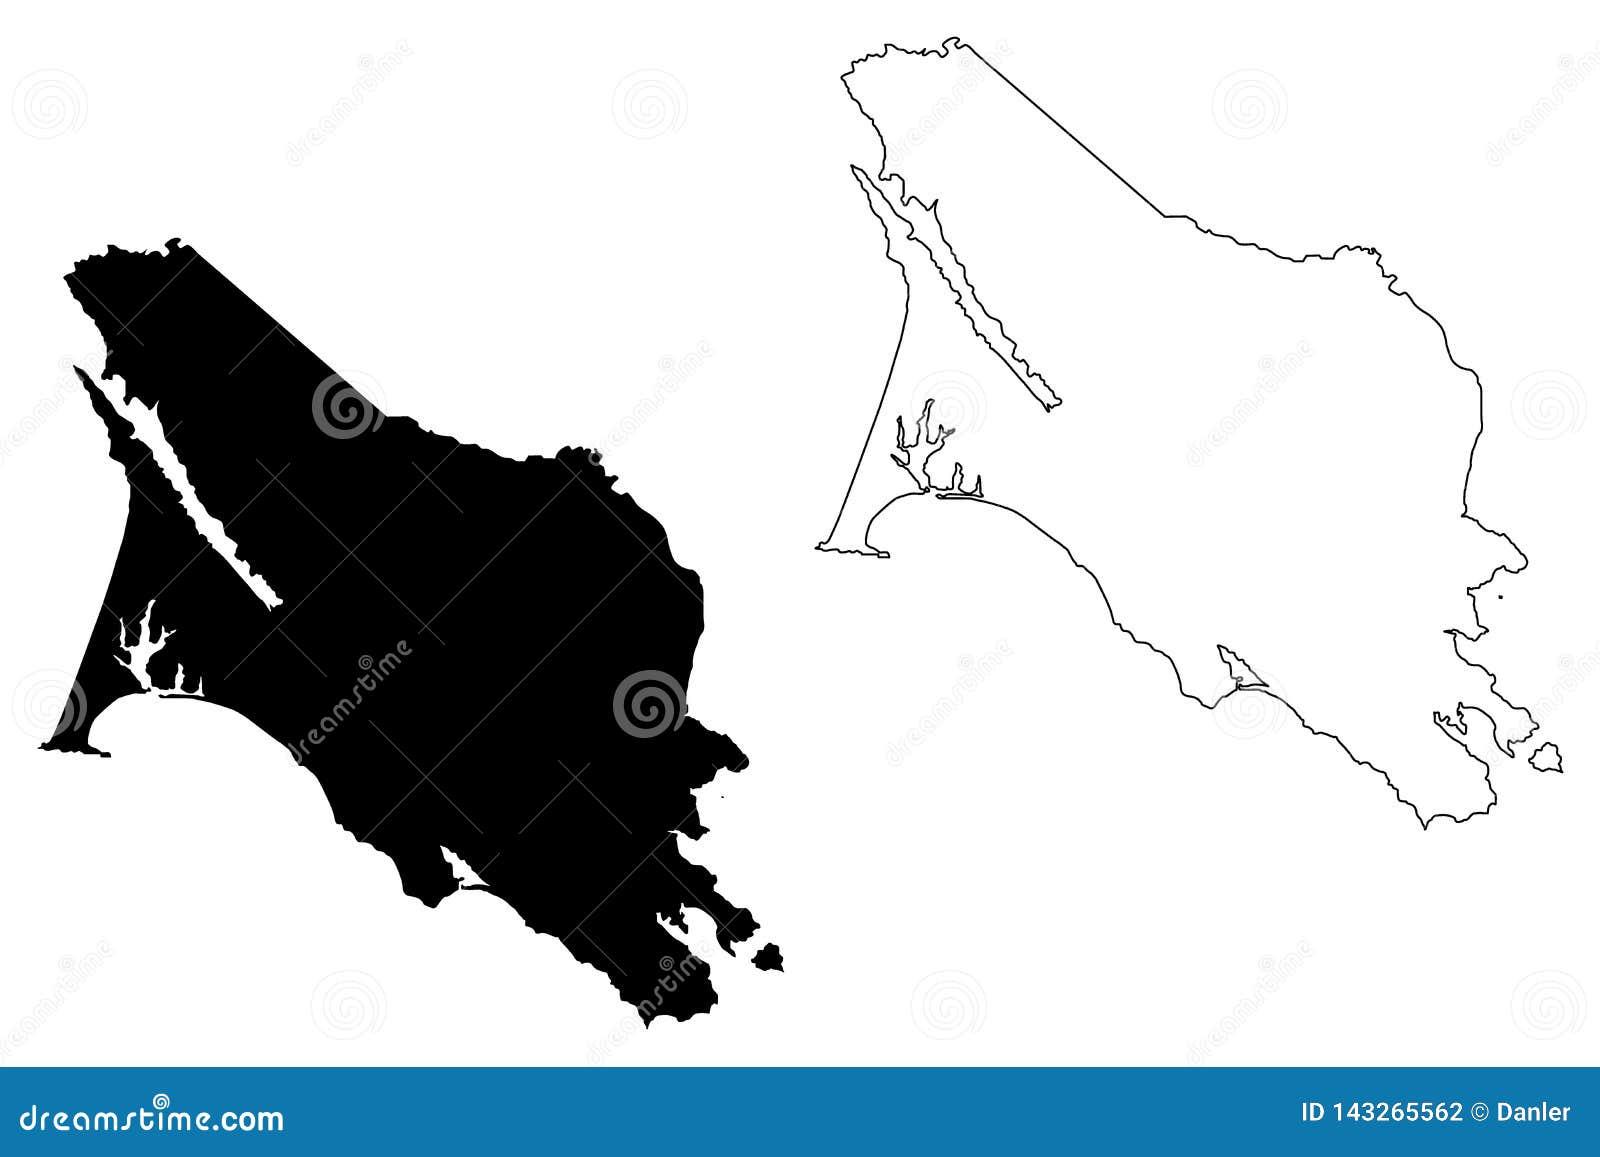 Marin County, vetor do mapa de Califórnia